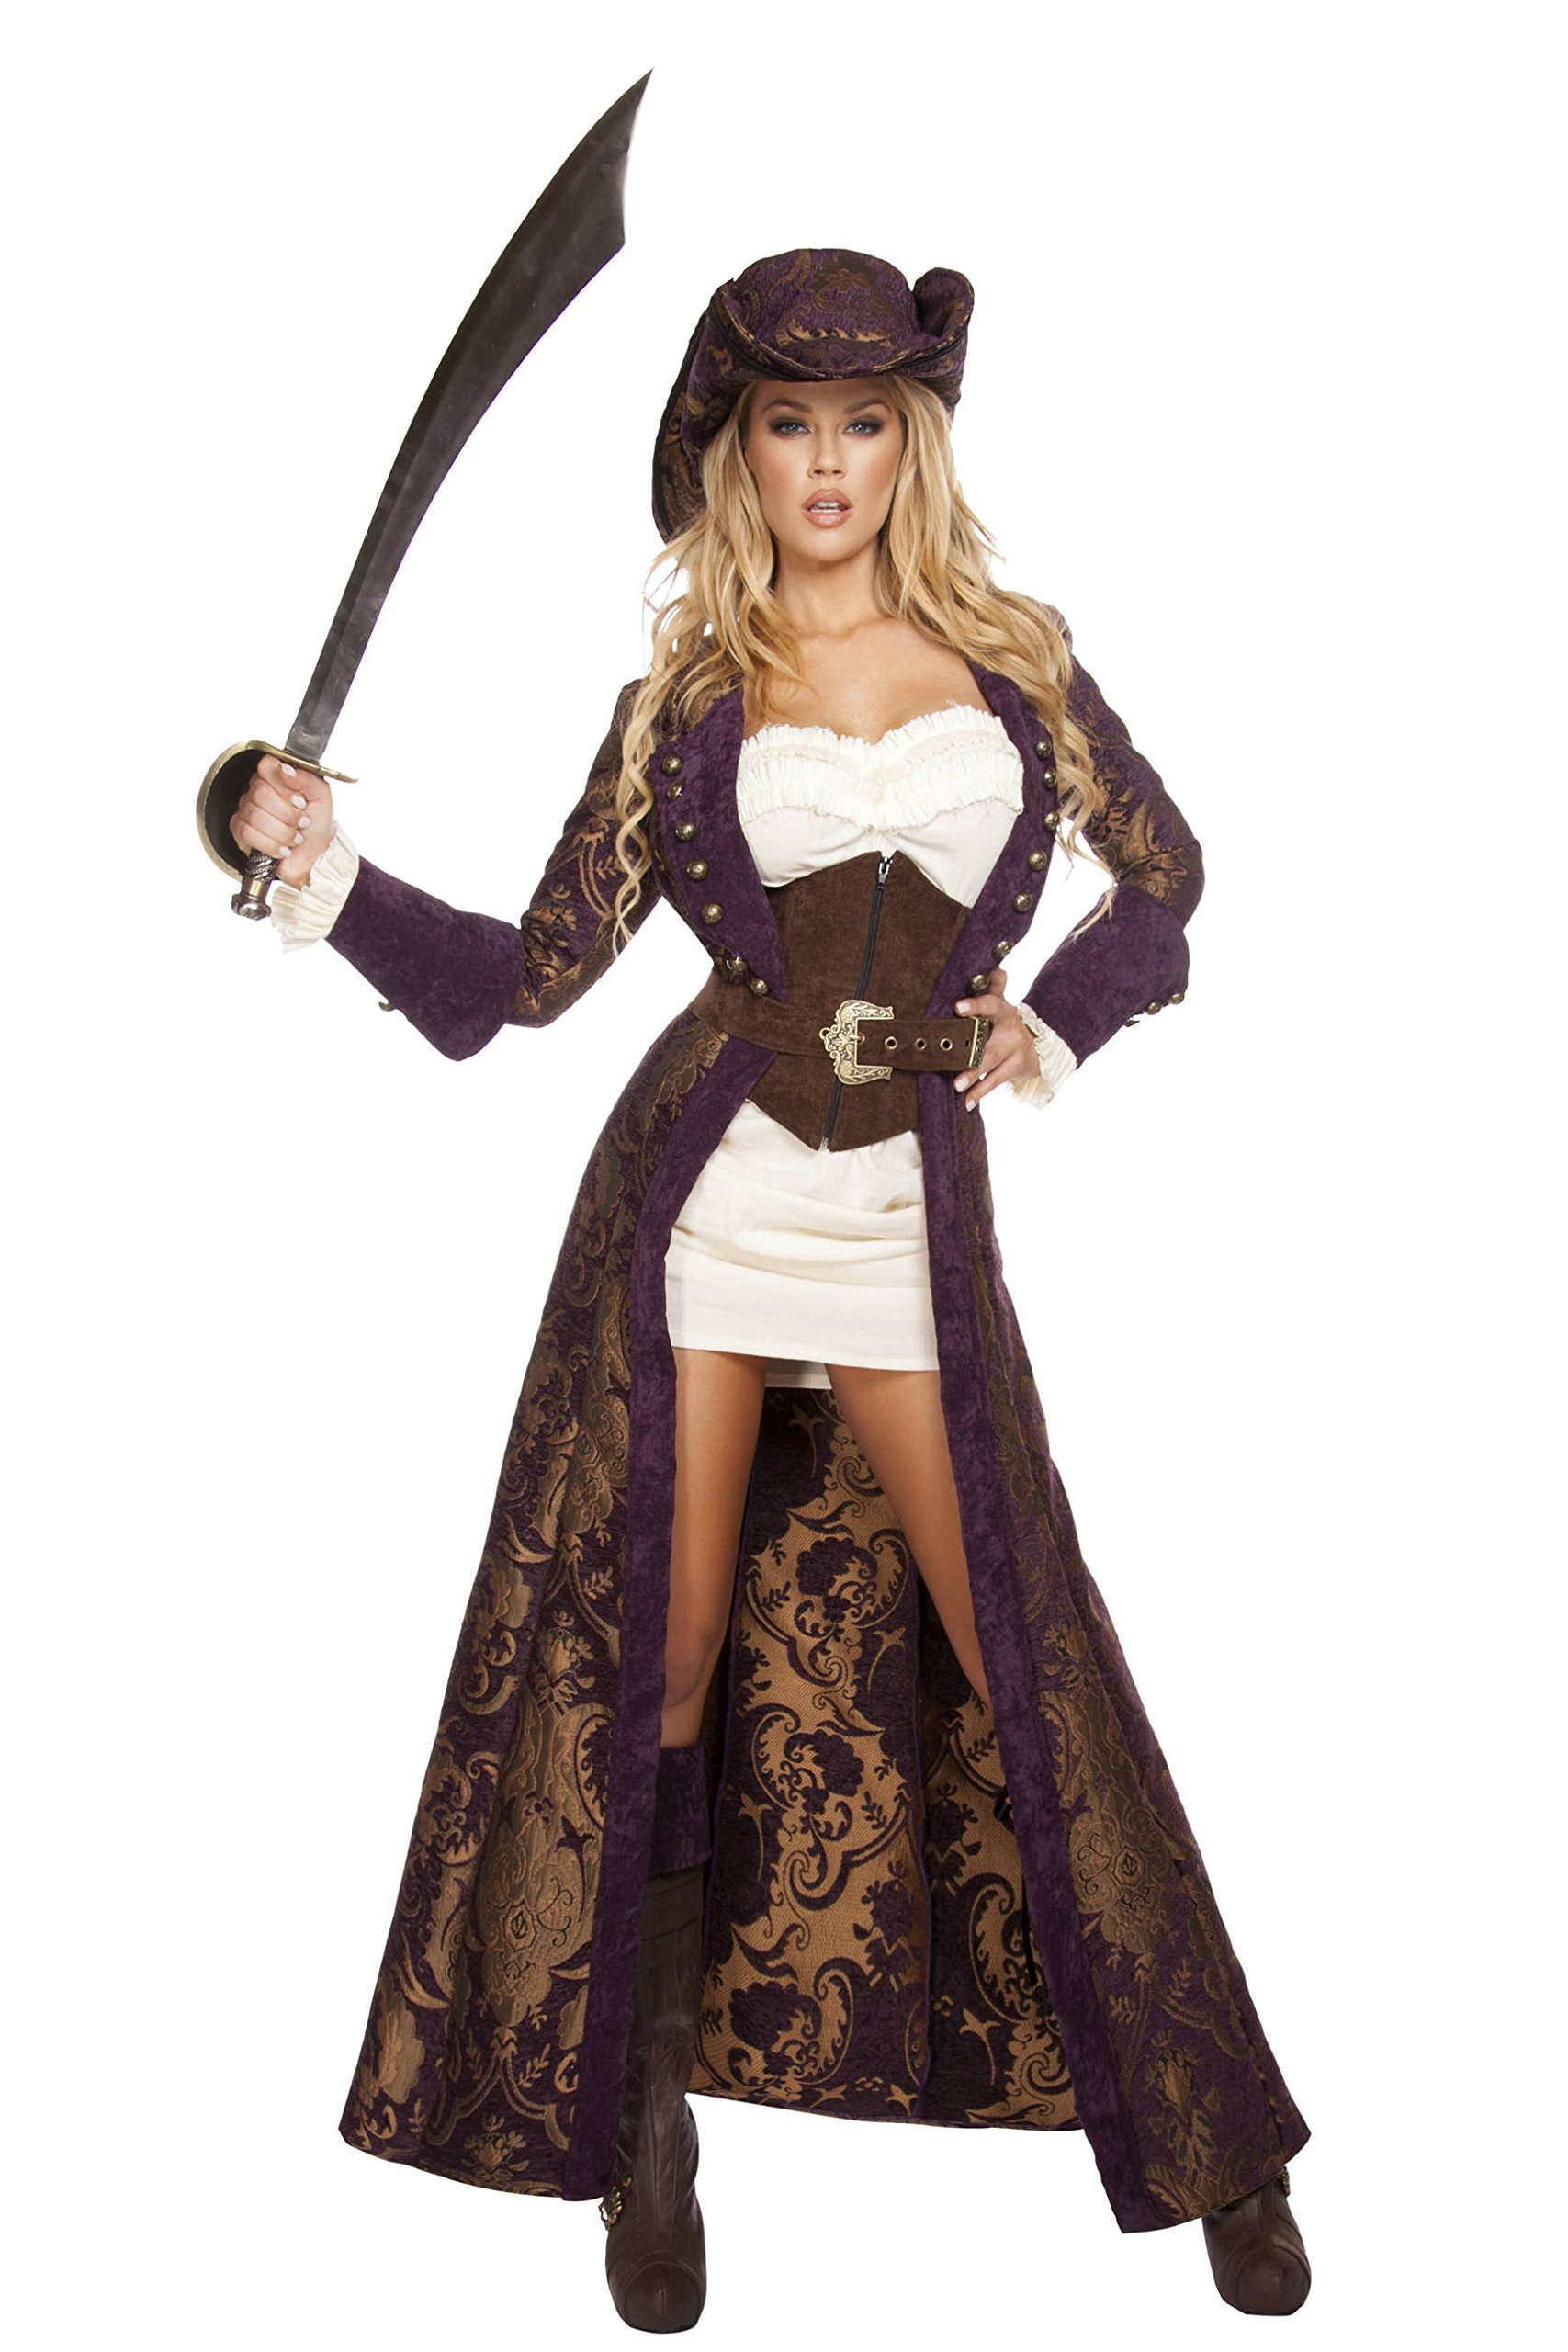 Roma Costume Women's 6 Piece Decadent Pirate Diva, Brown/Purple/White, Small by Roma Costume